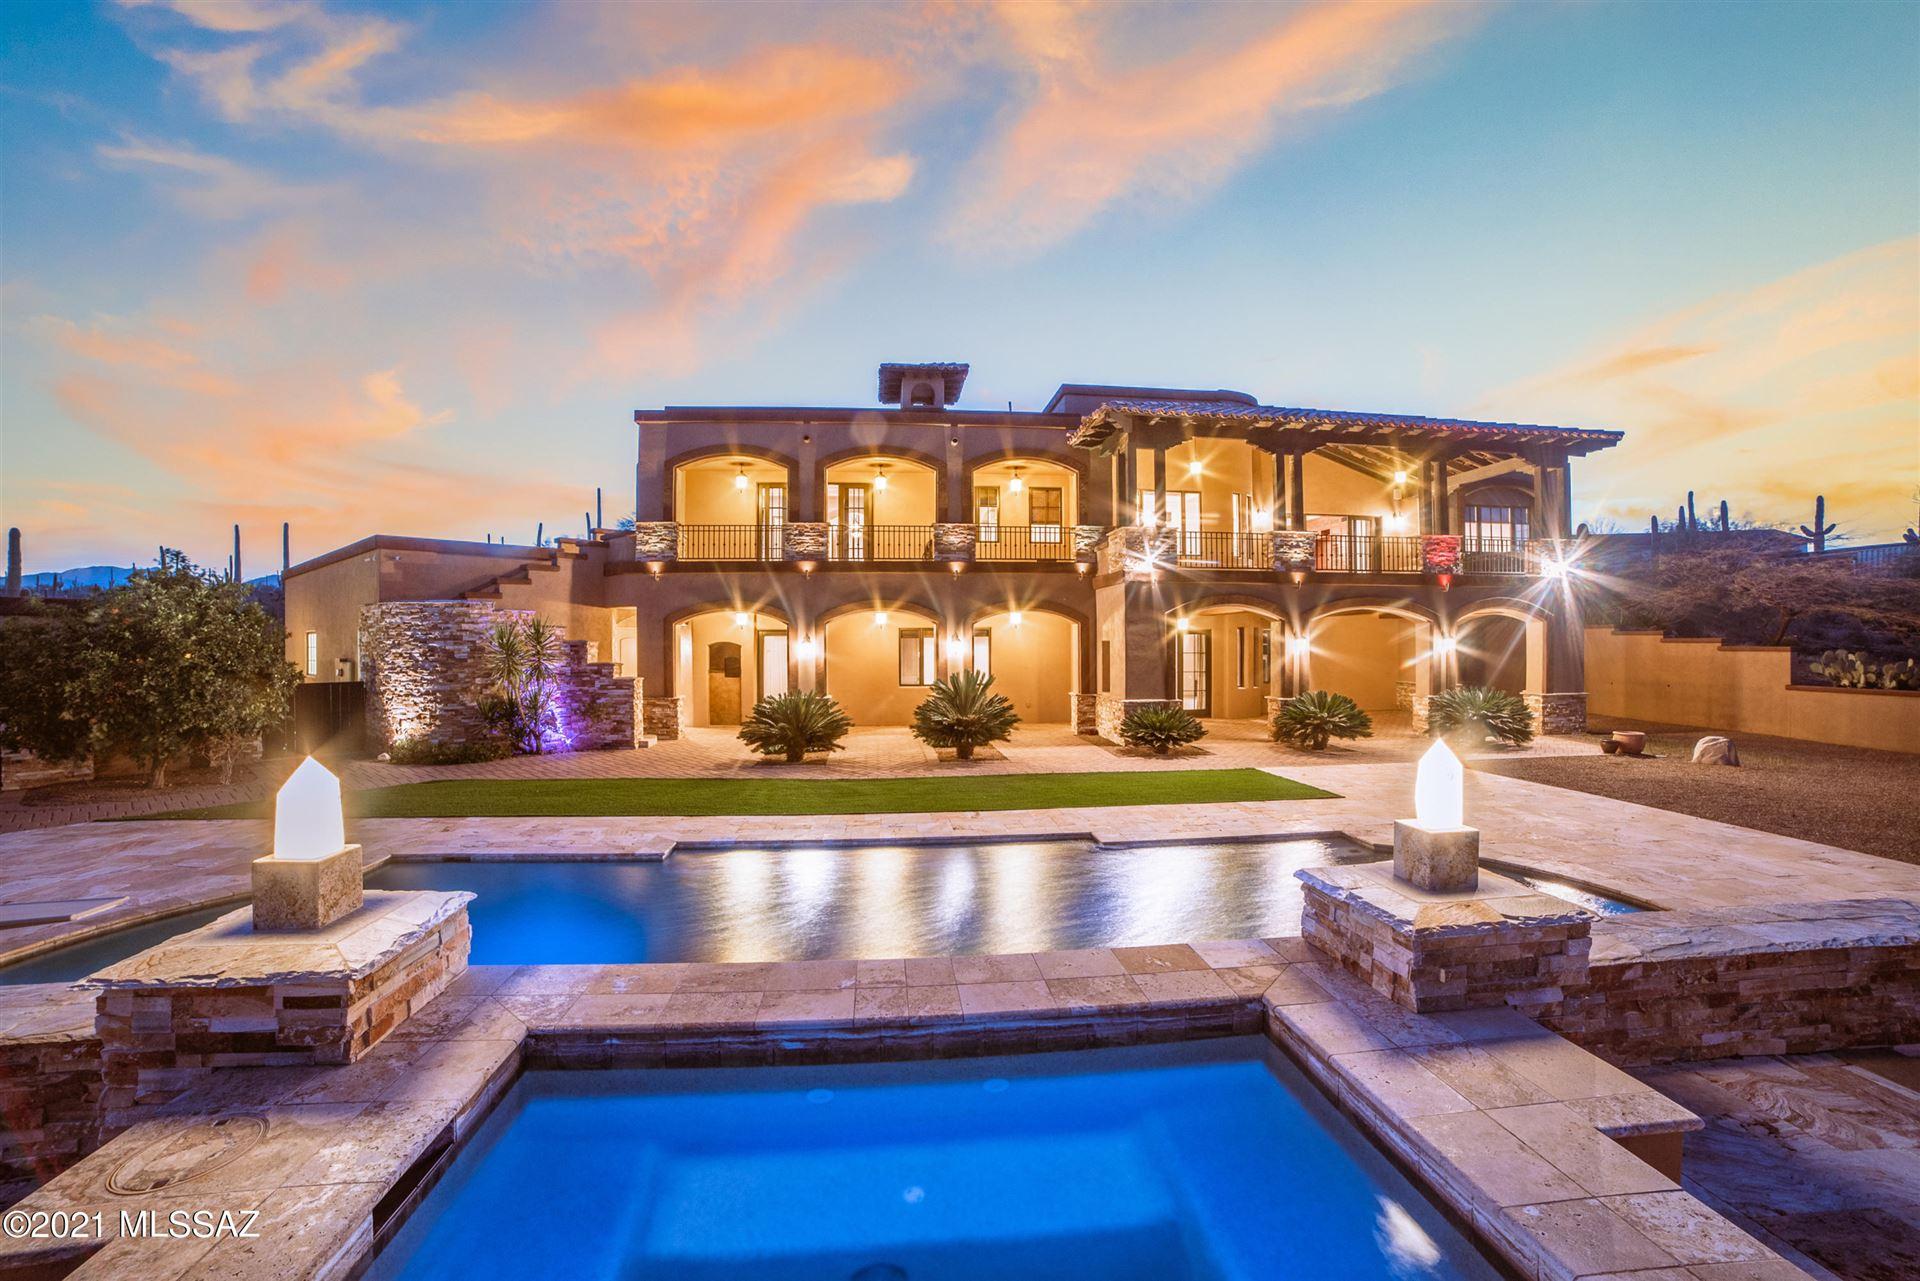 5760 W Crystal Valley Court, Tucson, AZ 85743 - MLS#: 22106926